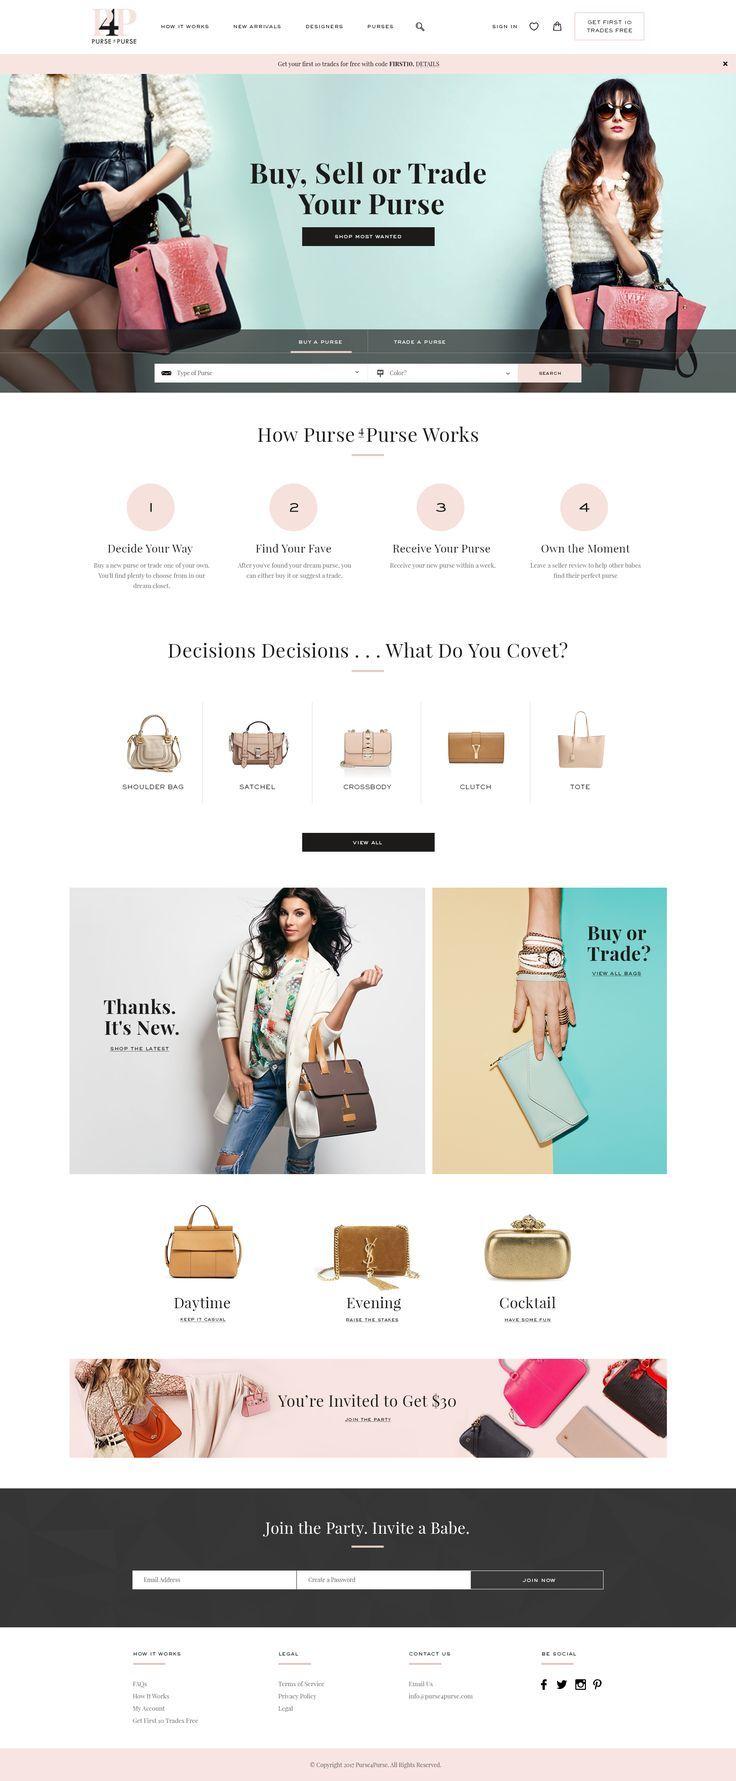 11 top tips for outstanding ecommerce website design - 99designs